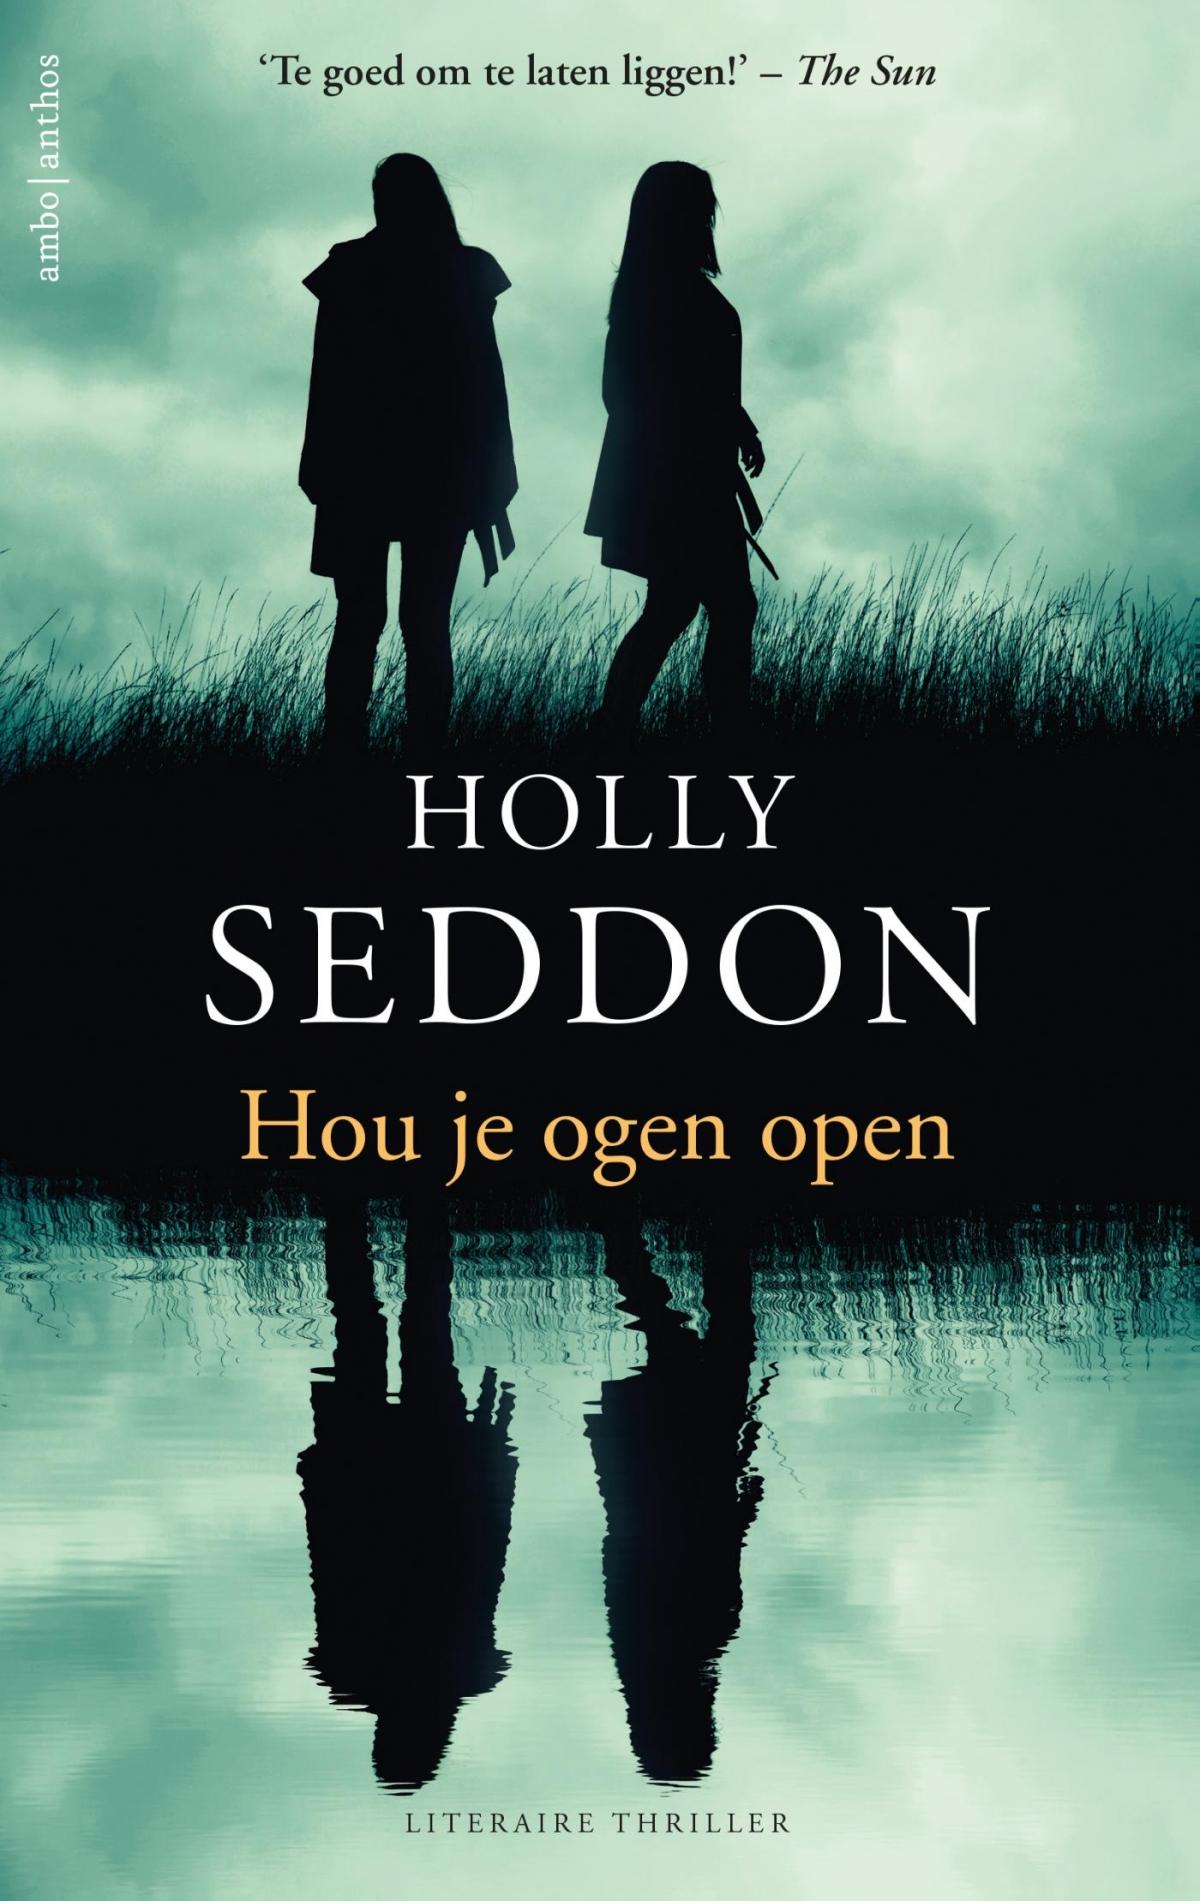 Hou je ogen open - Holly Seddon